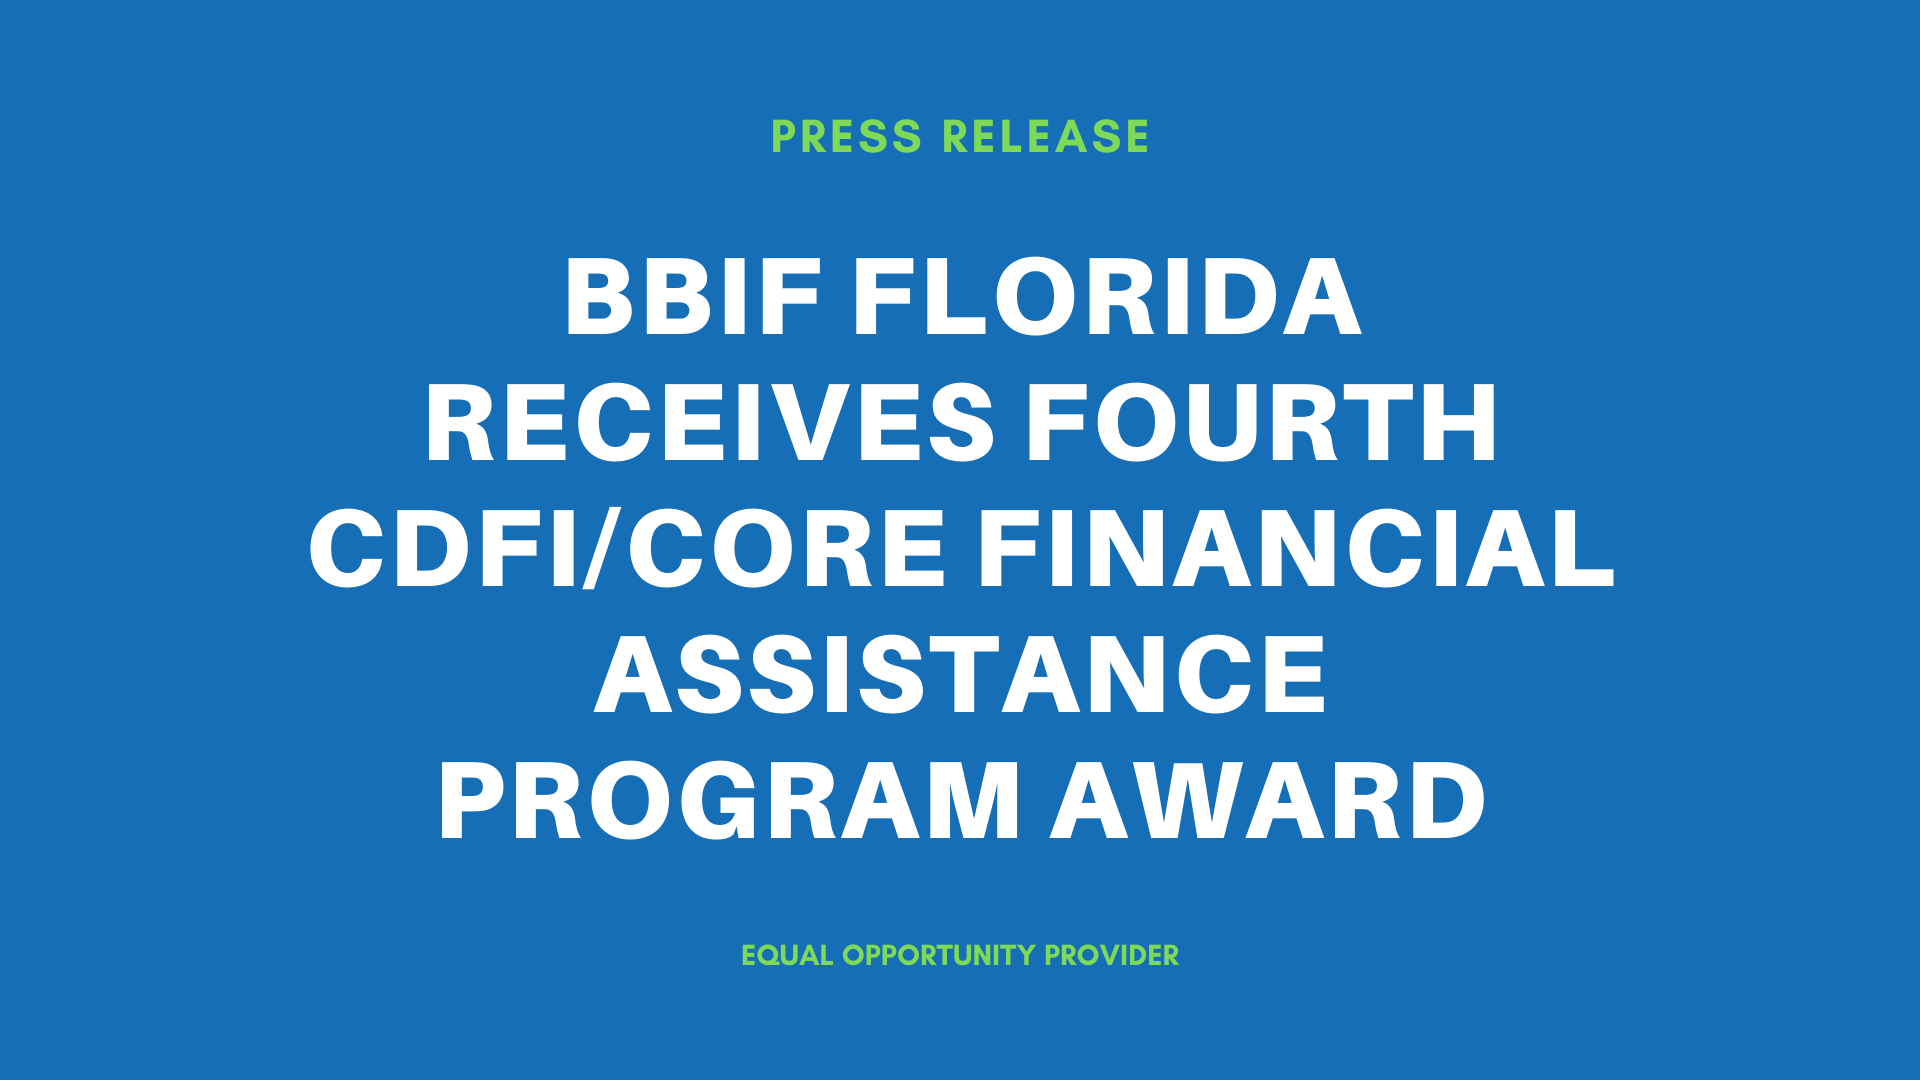 BBIF Florida Receives Fourth CDFI/CORE Financial Assistance Program Award